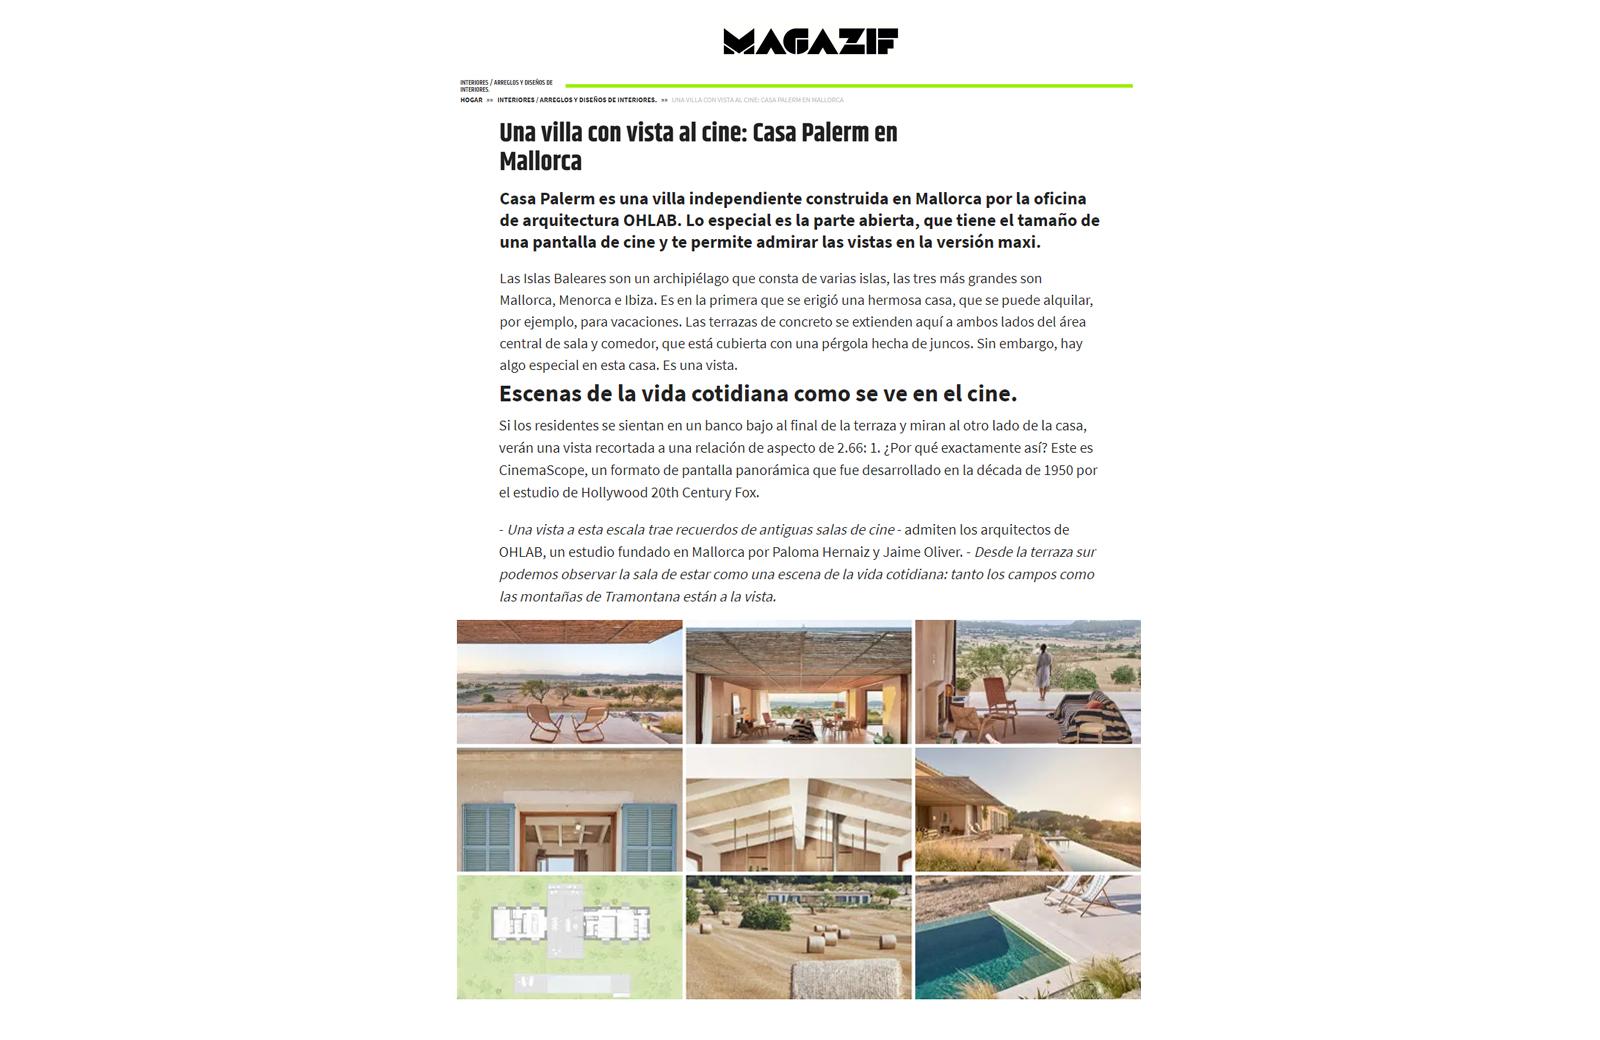 200715_magazif_-1600x1040